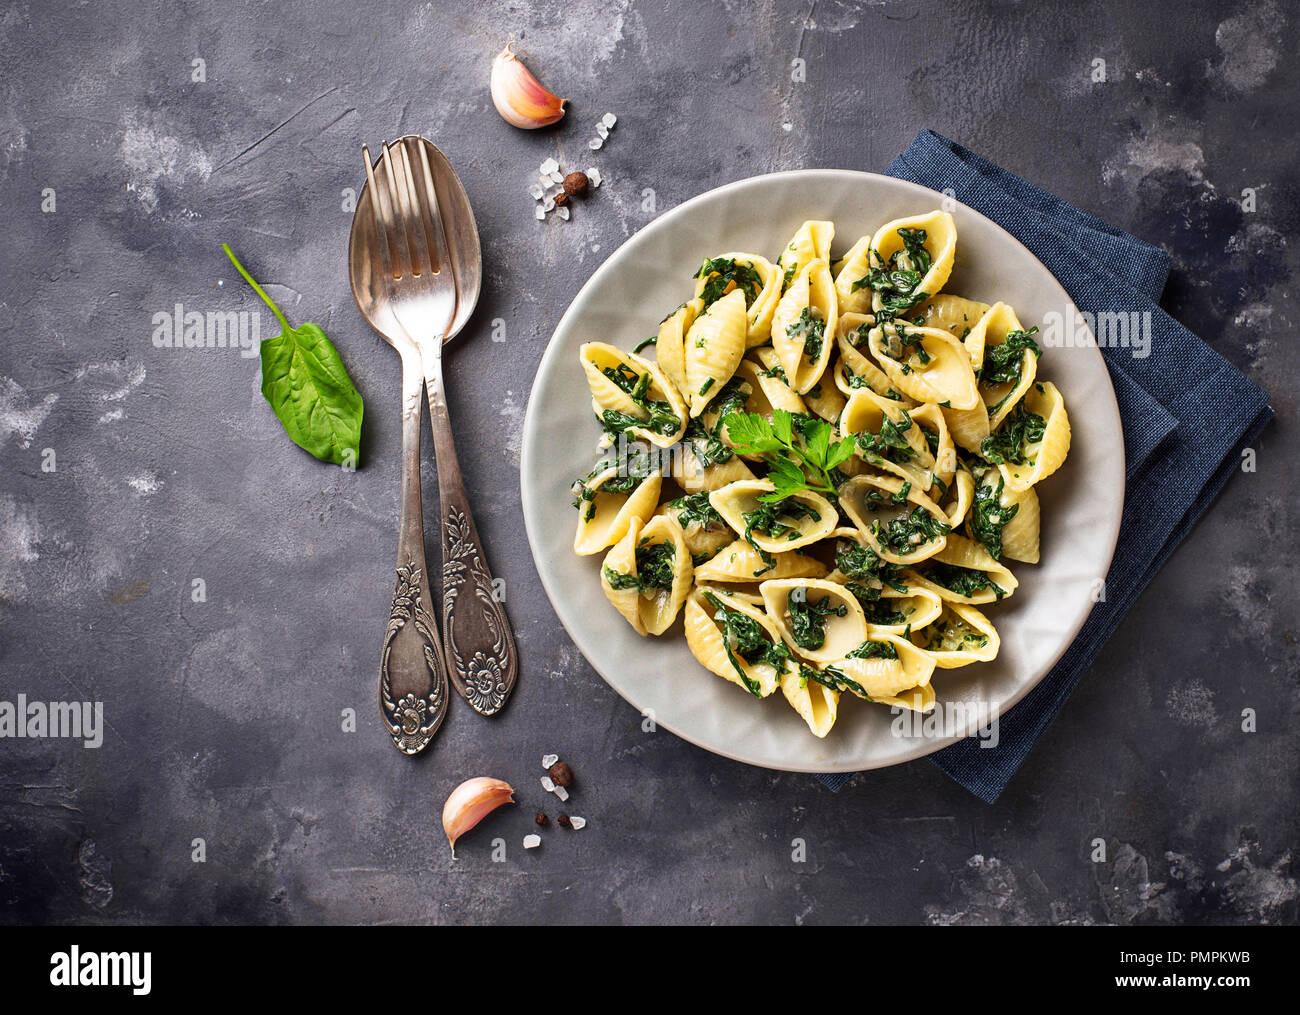 Conchiglioni Nudeln mit Spinat cremige Soße Stockfoto